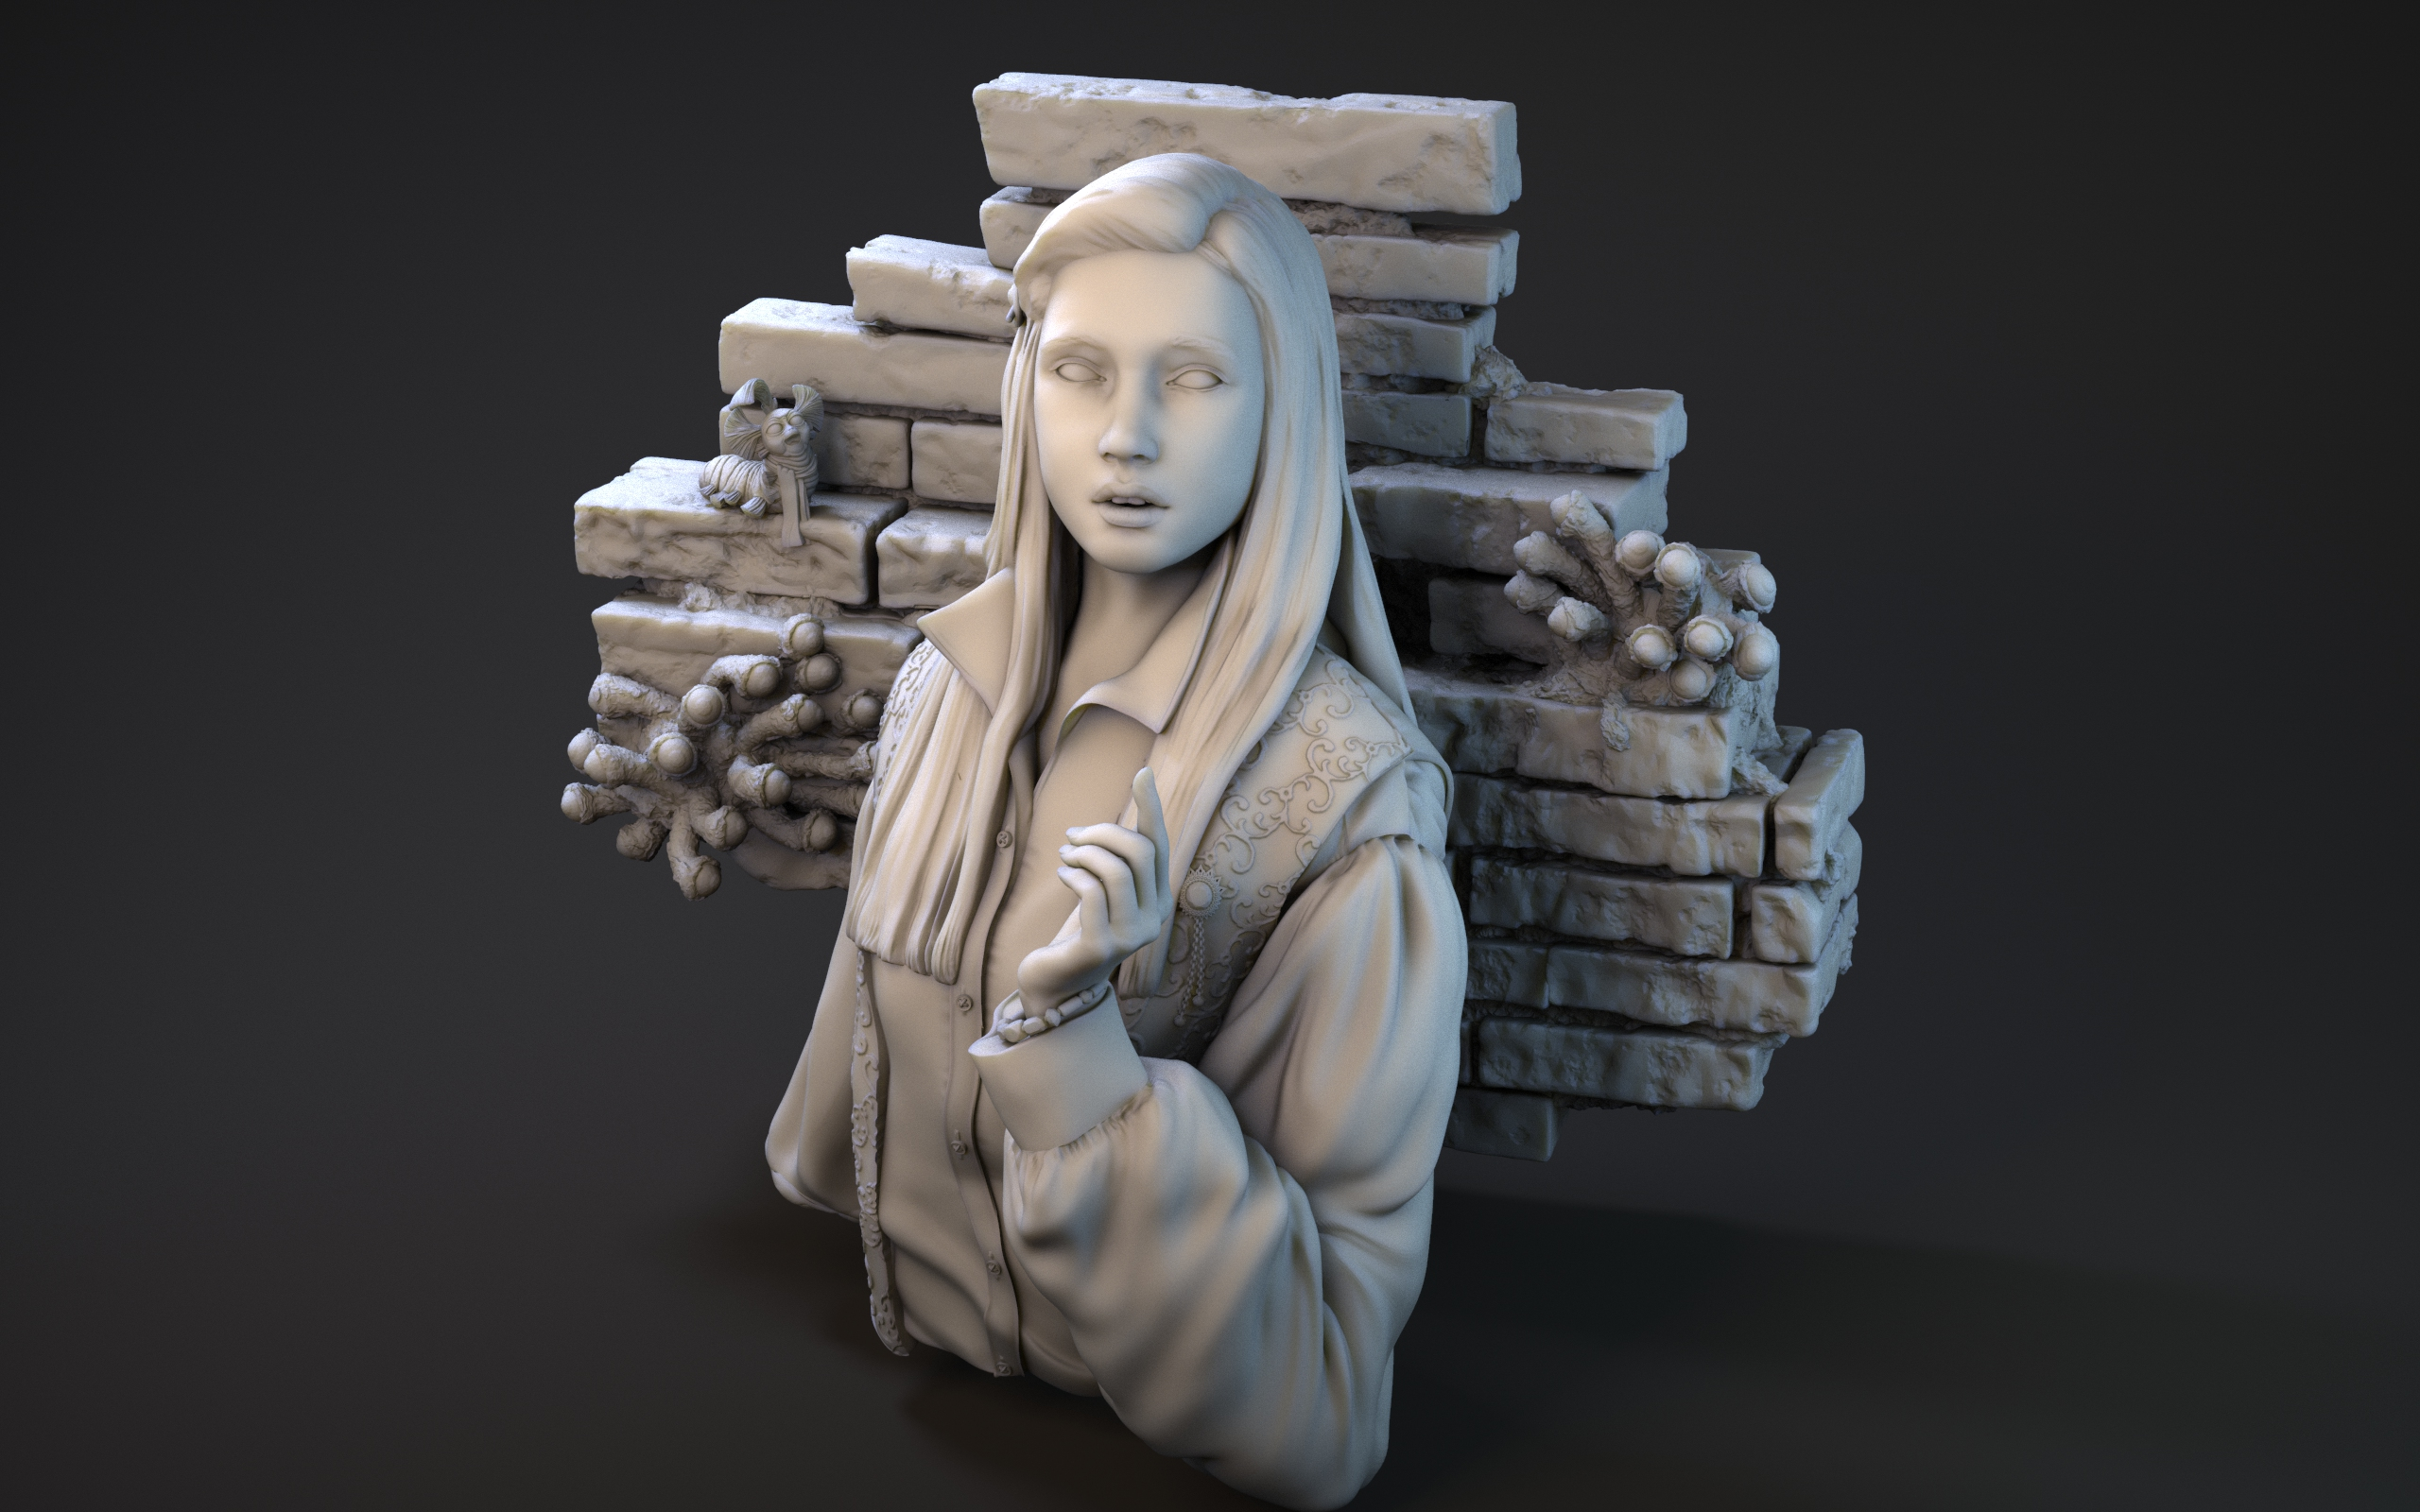 Miniaturas 3D Dentro del Laberinto Sarah